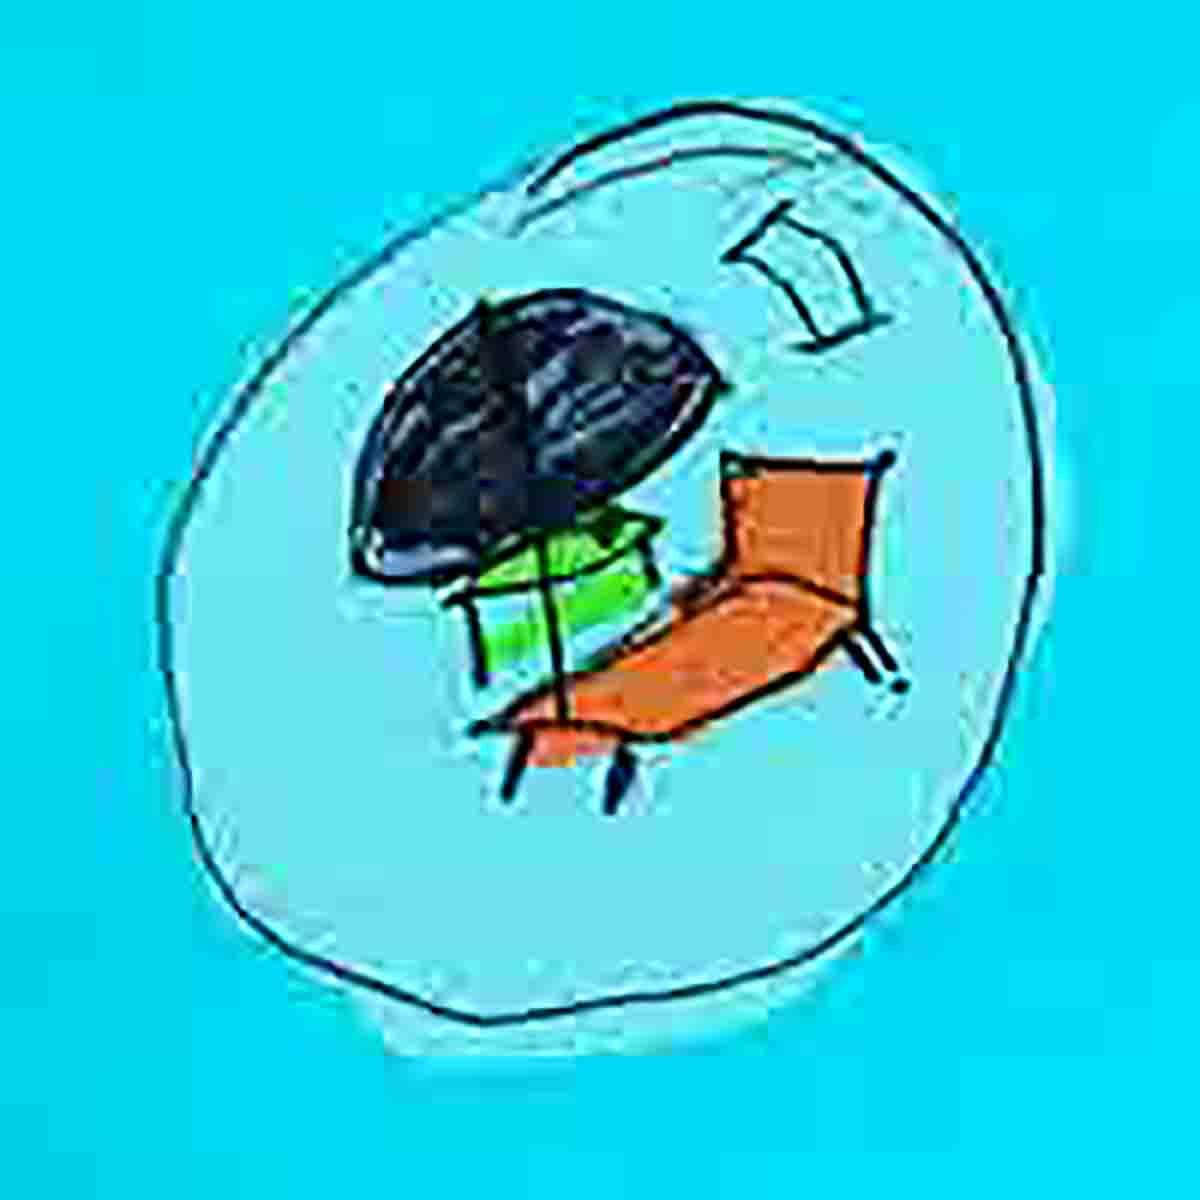 umbrella bubble0a.jpg